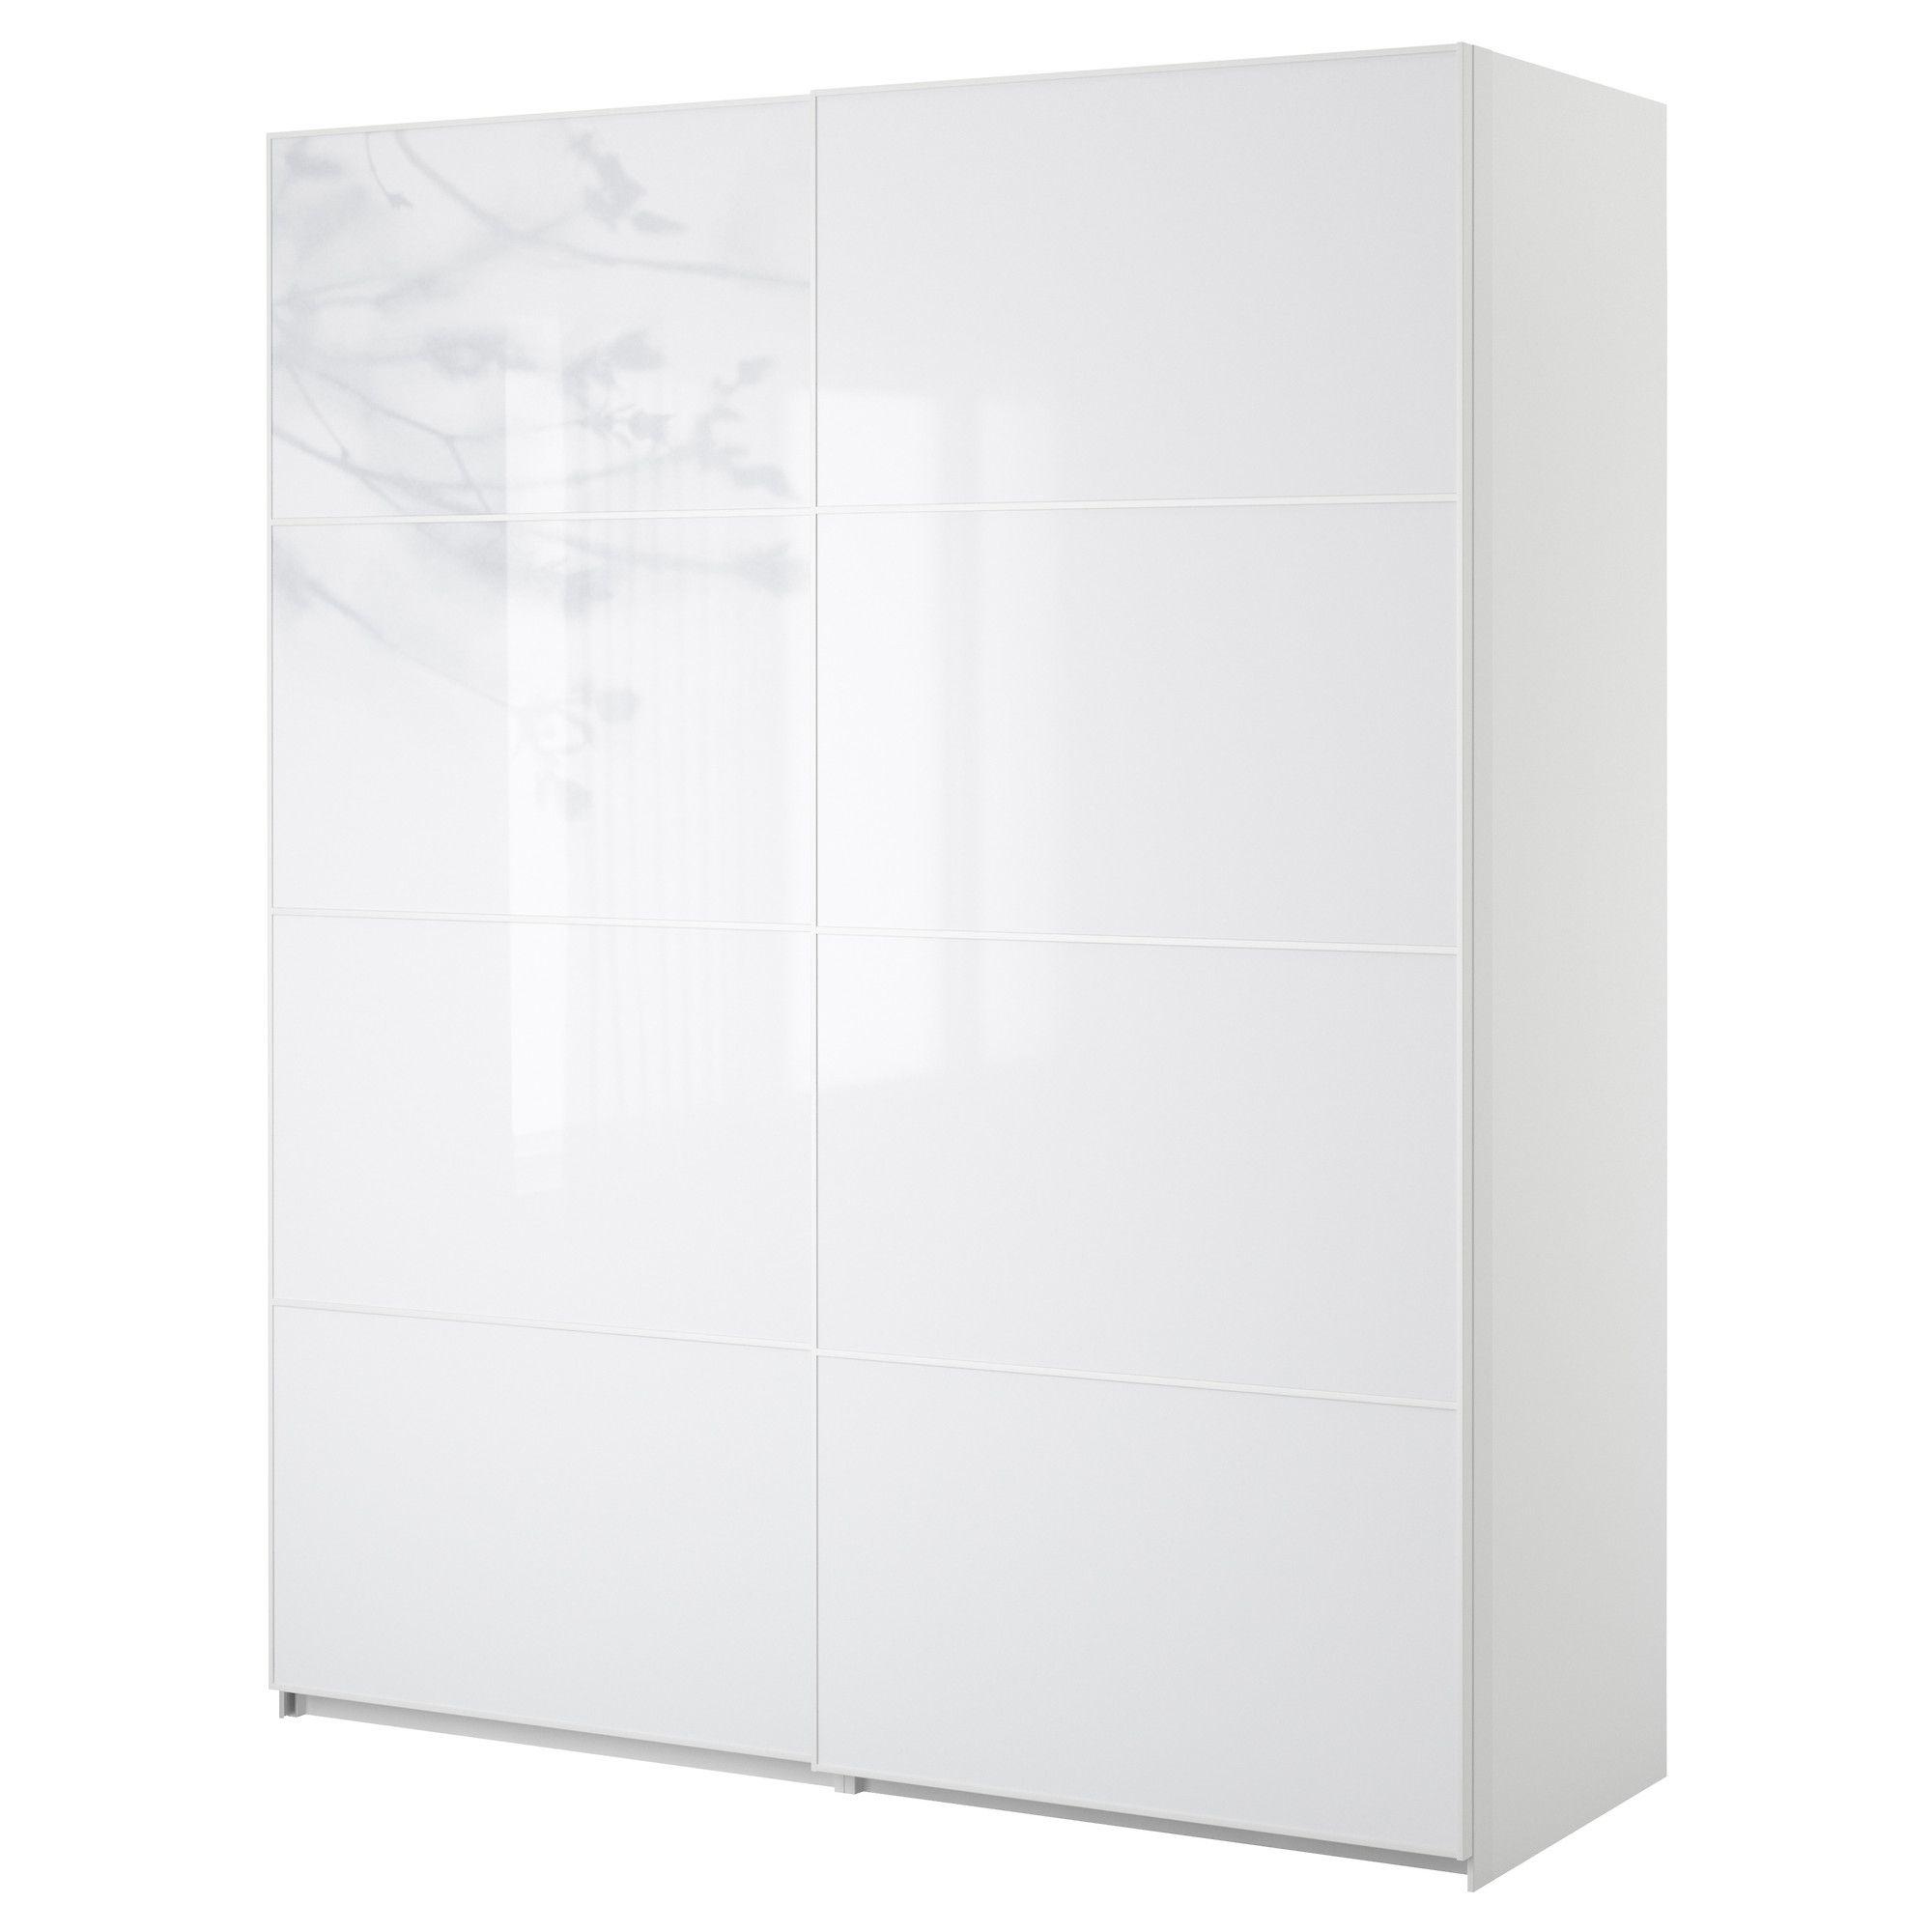 Ikea Pax Tonnes Wardrobe Drzwi